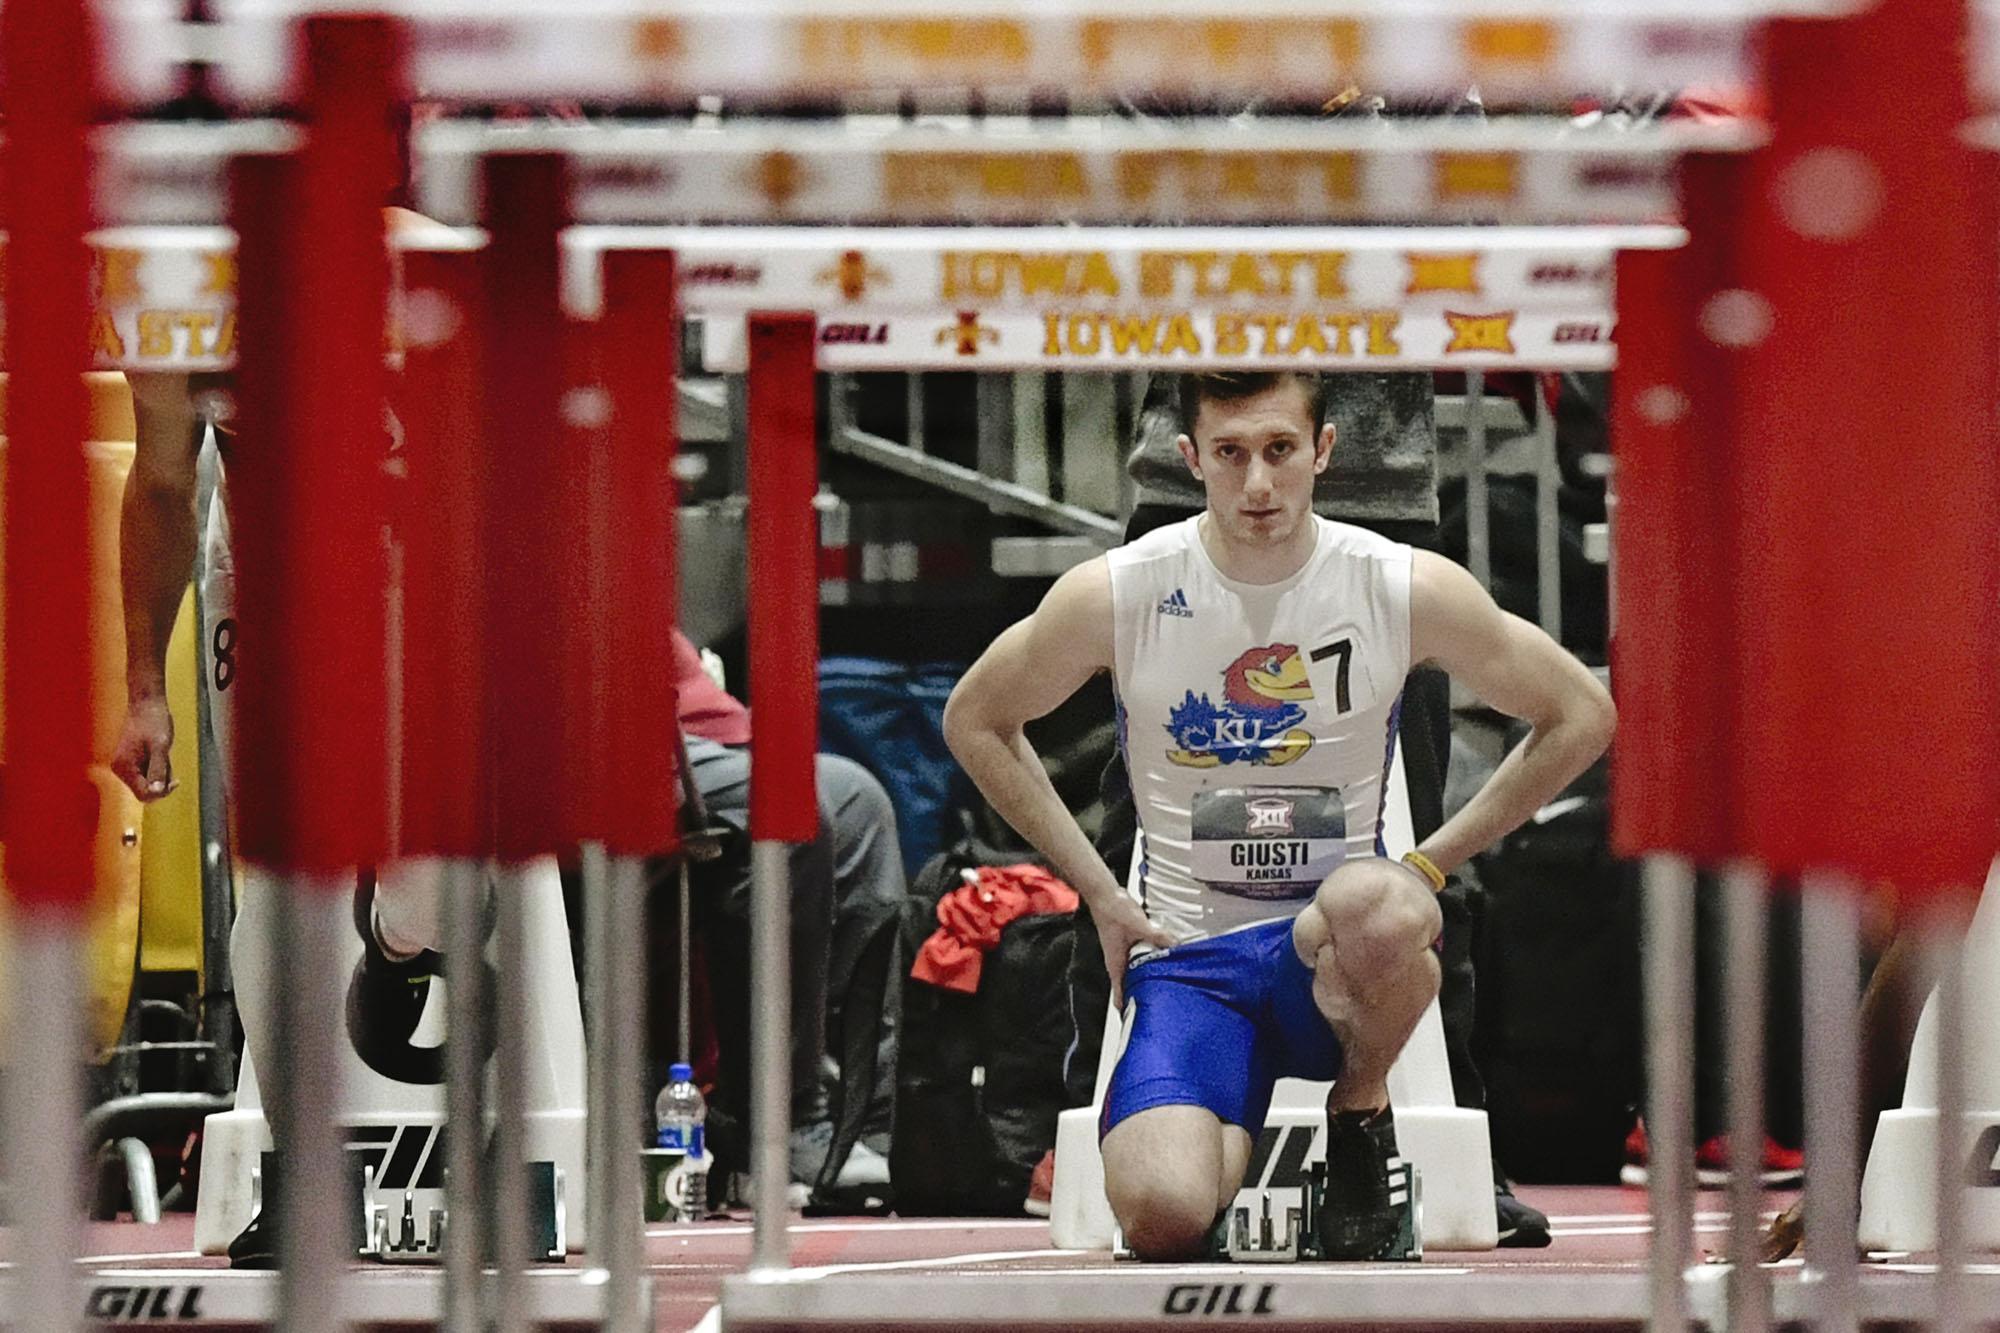 hurdles ahead